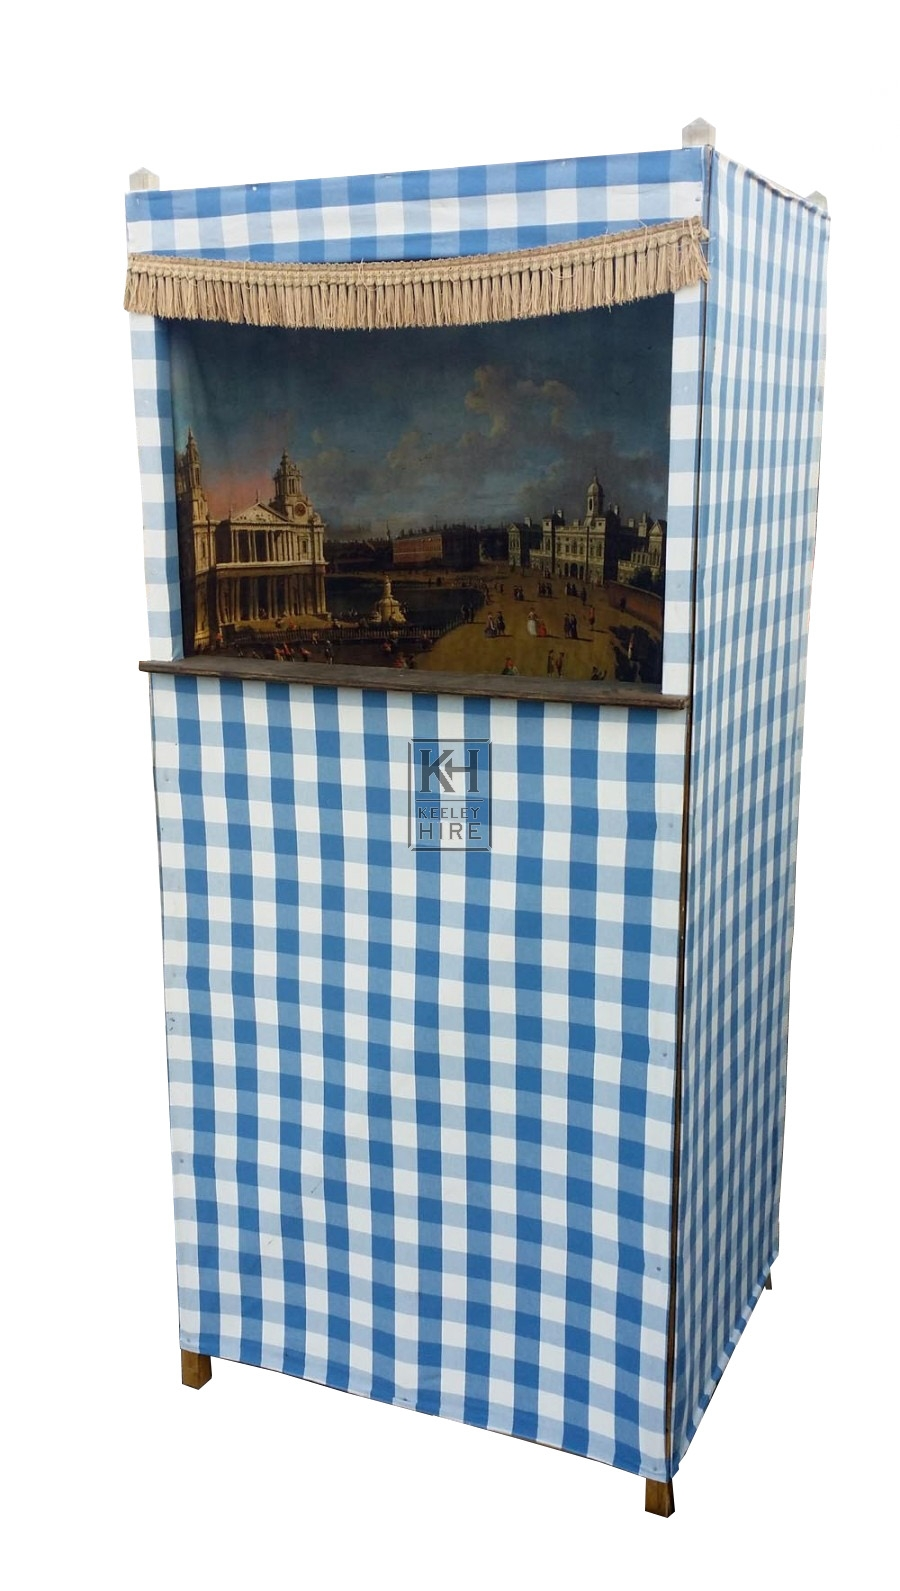 Blue stripe& white punch & judy tent